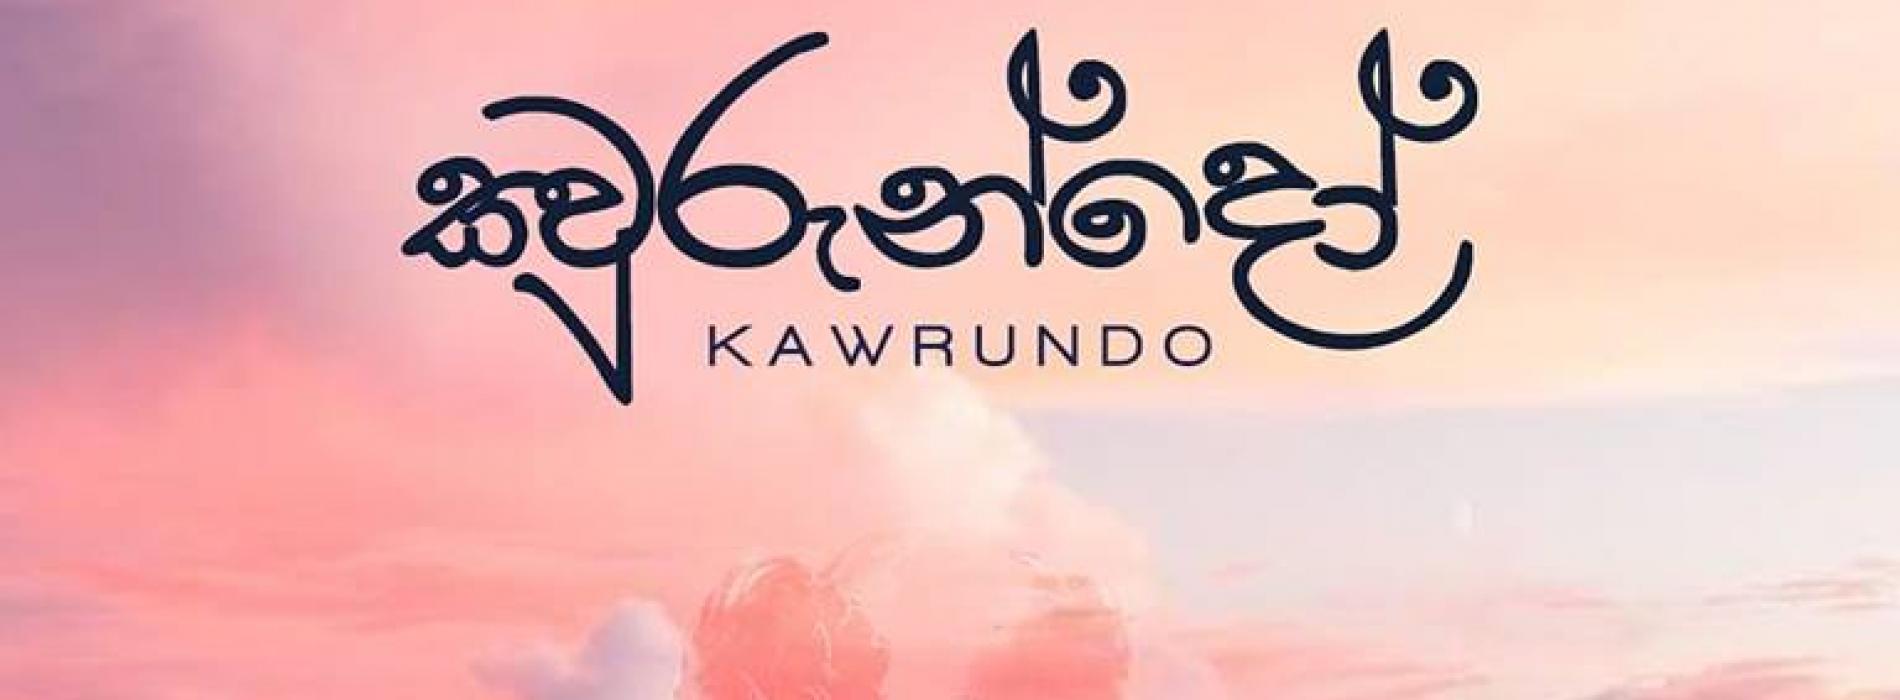 Channuka Devnindu – Kawrundo(කවුරුන්දෝ) [Official Audio]